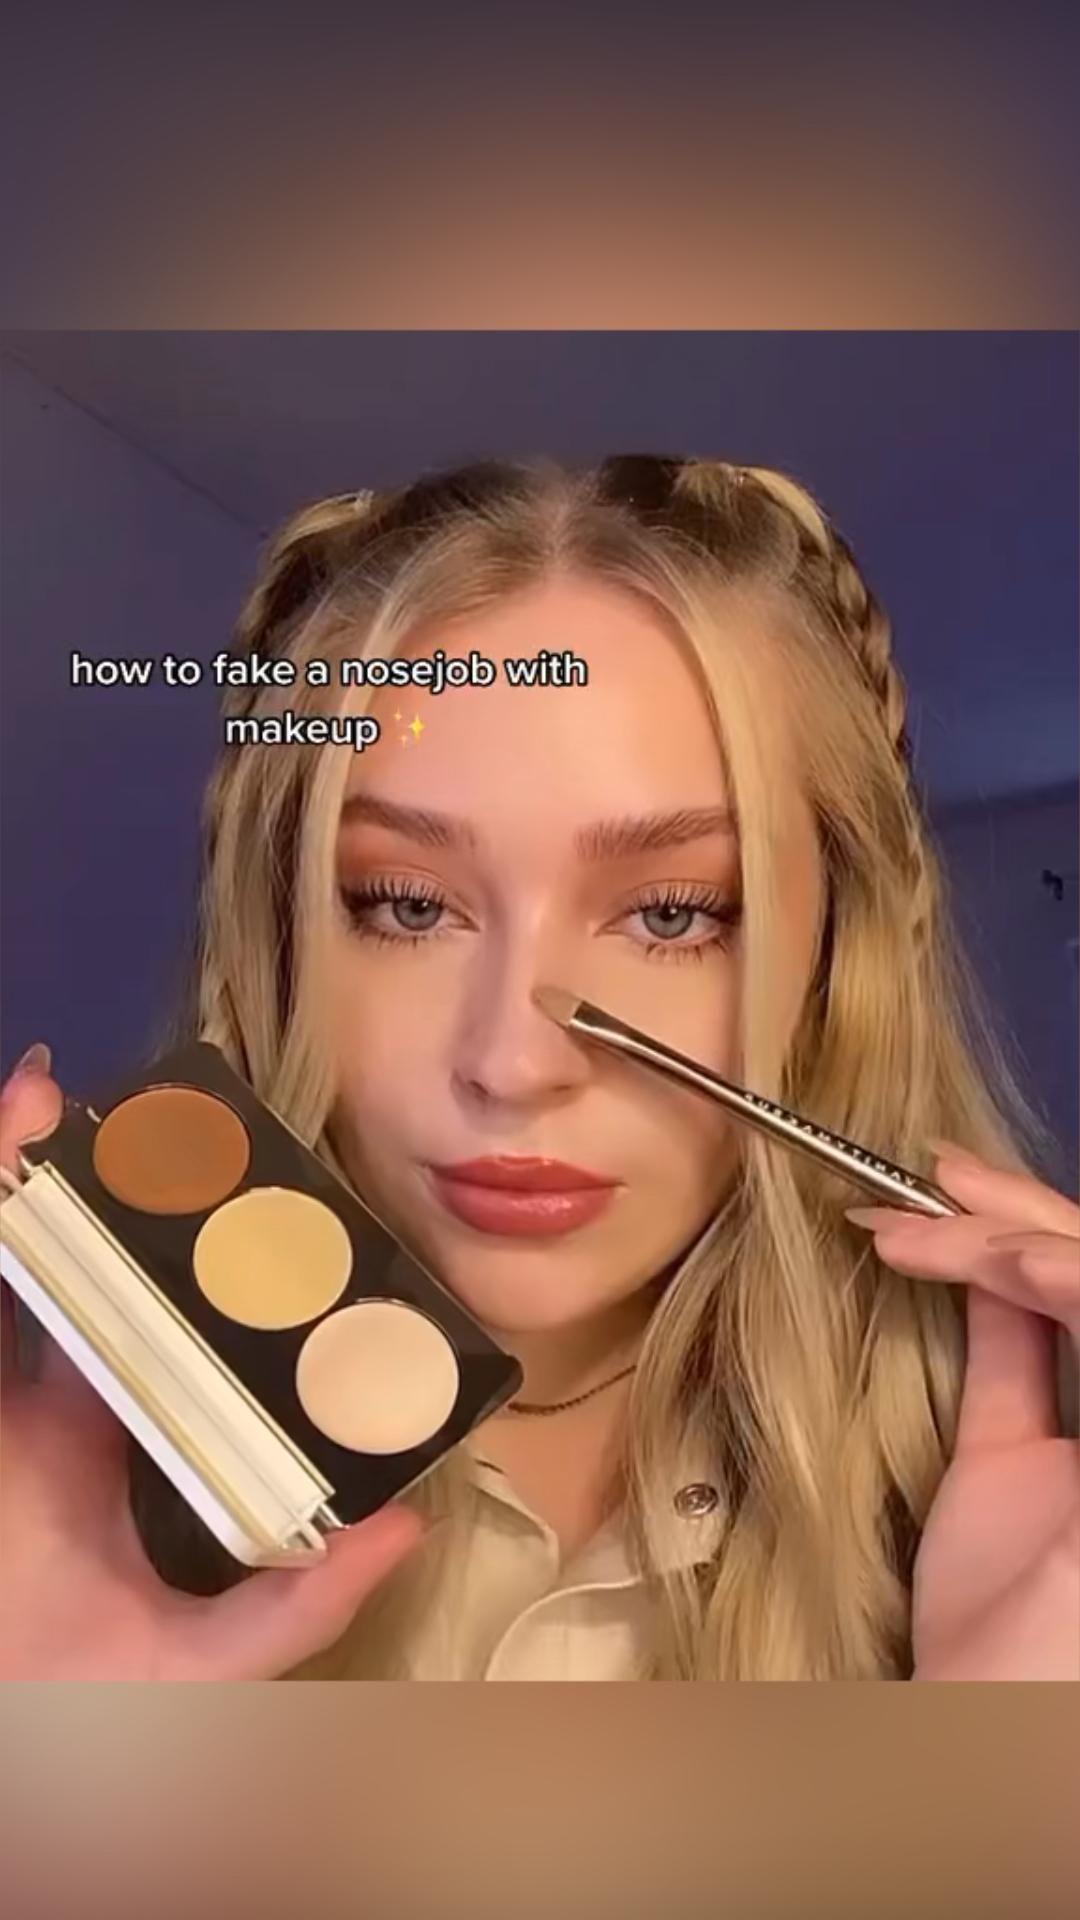 How to fake a nosejob with makeup